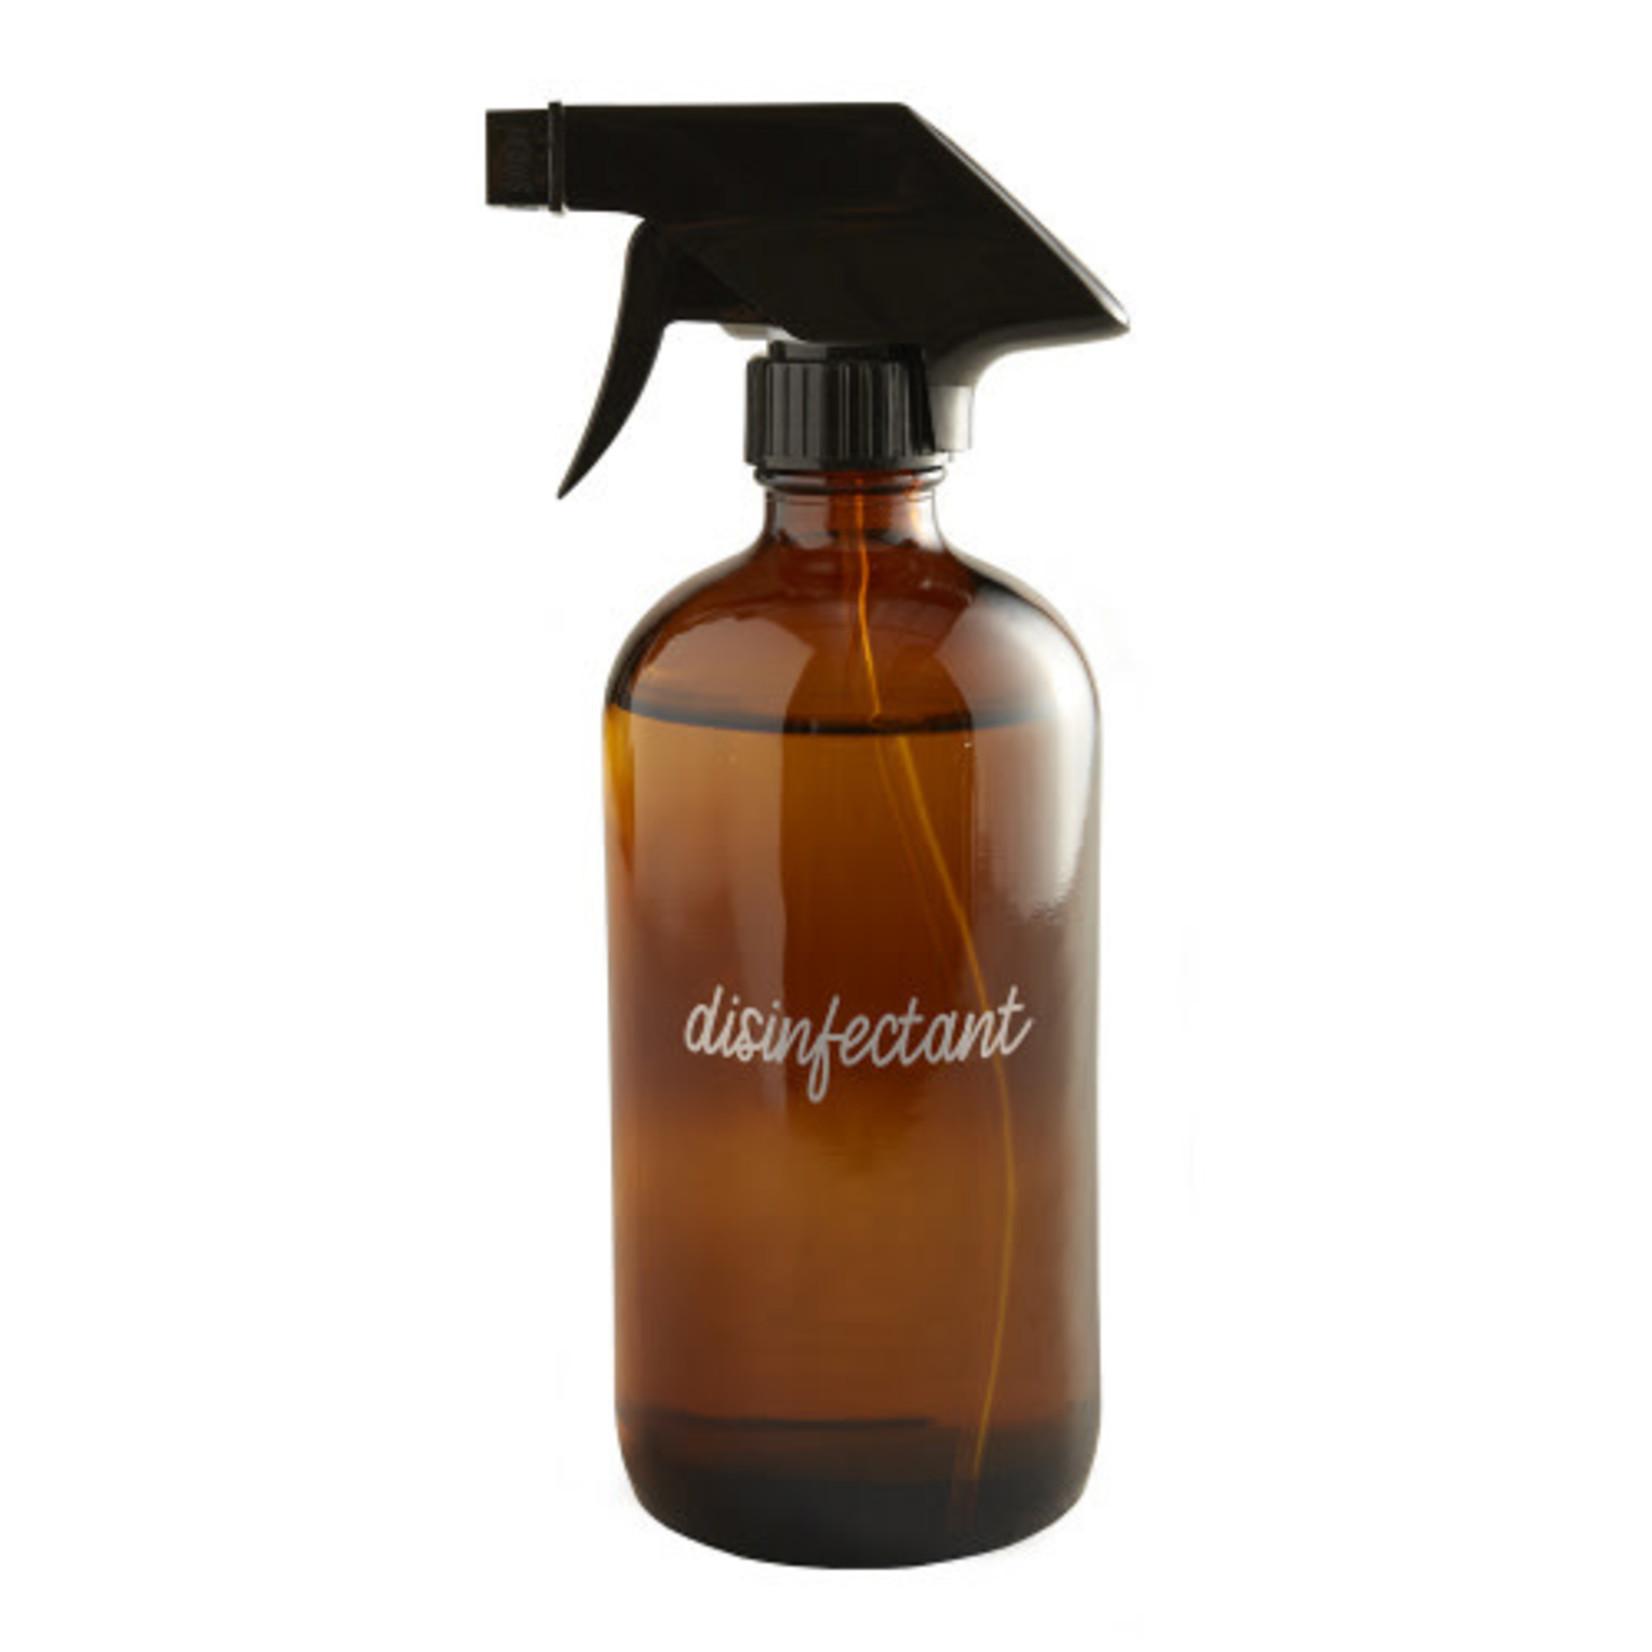 Amber Disinfectant Bottle